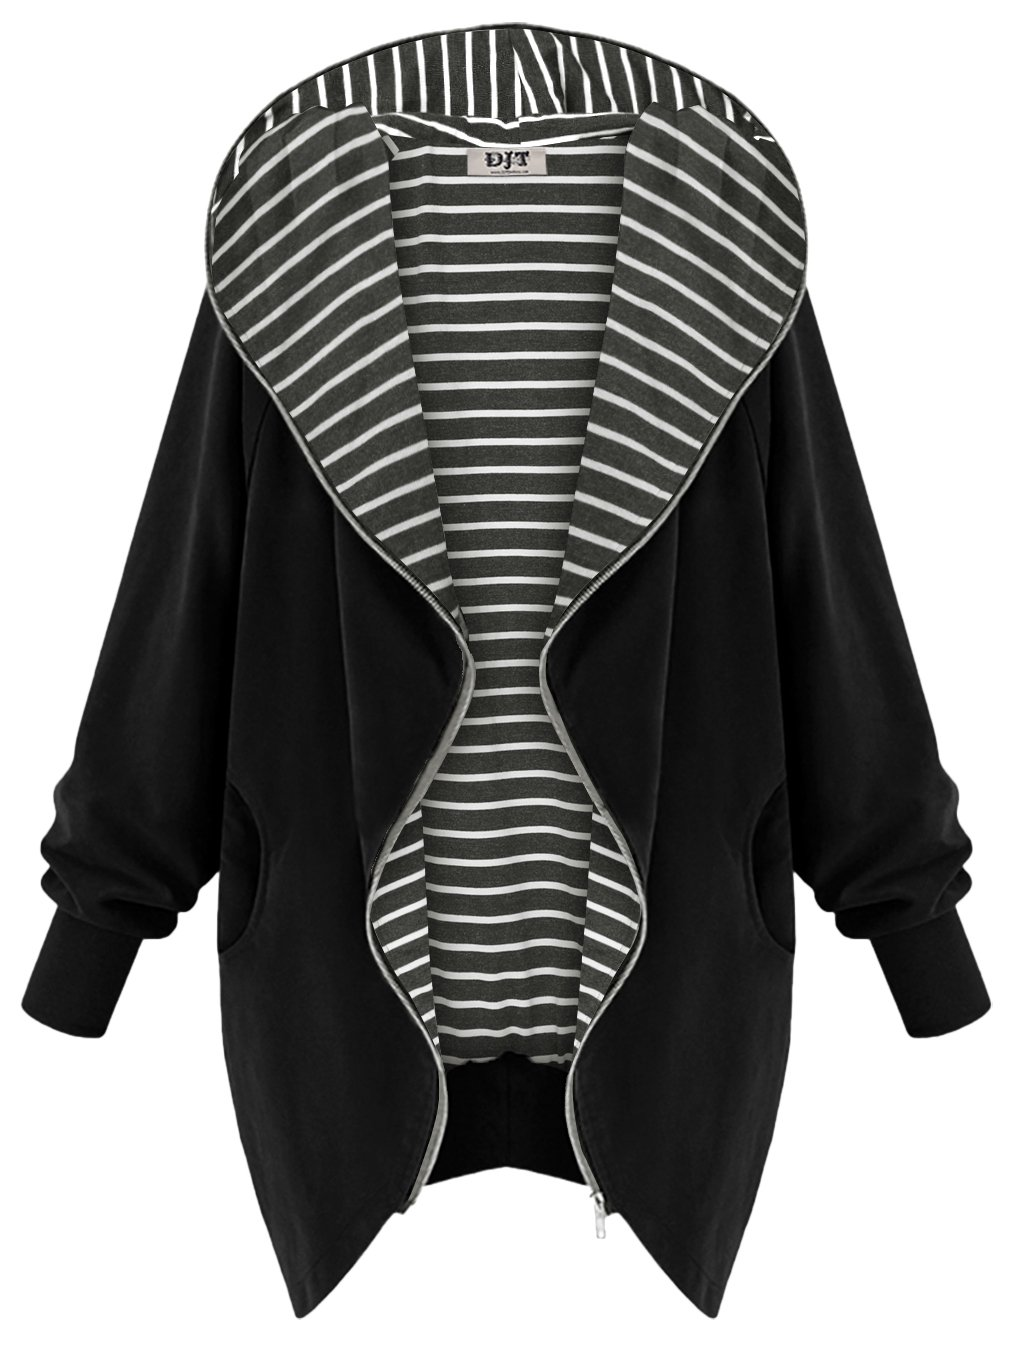 DJT Women's Hooded Zip-up Lightweight Coat Jacket Small Black-Stripe